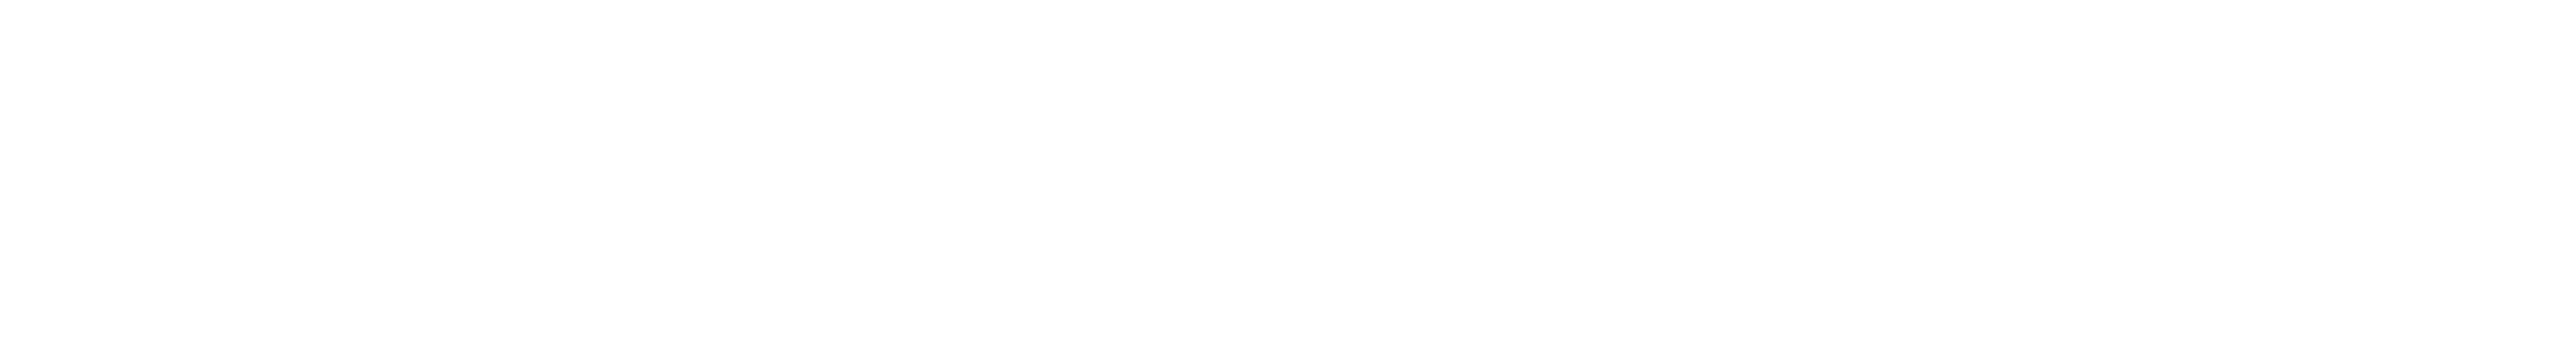 sulfomet_logo